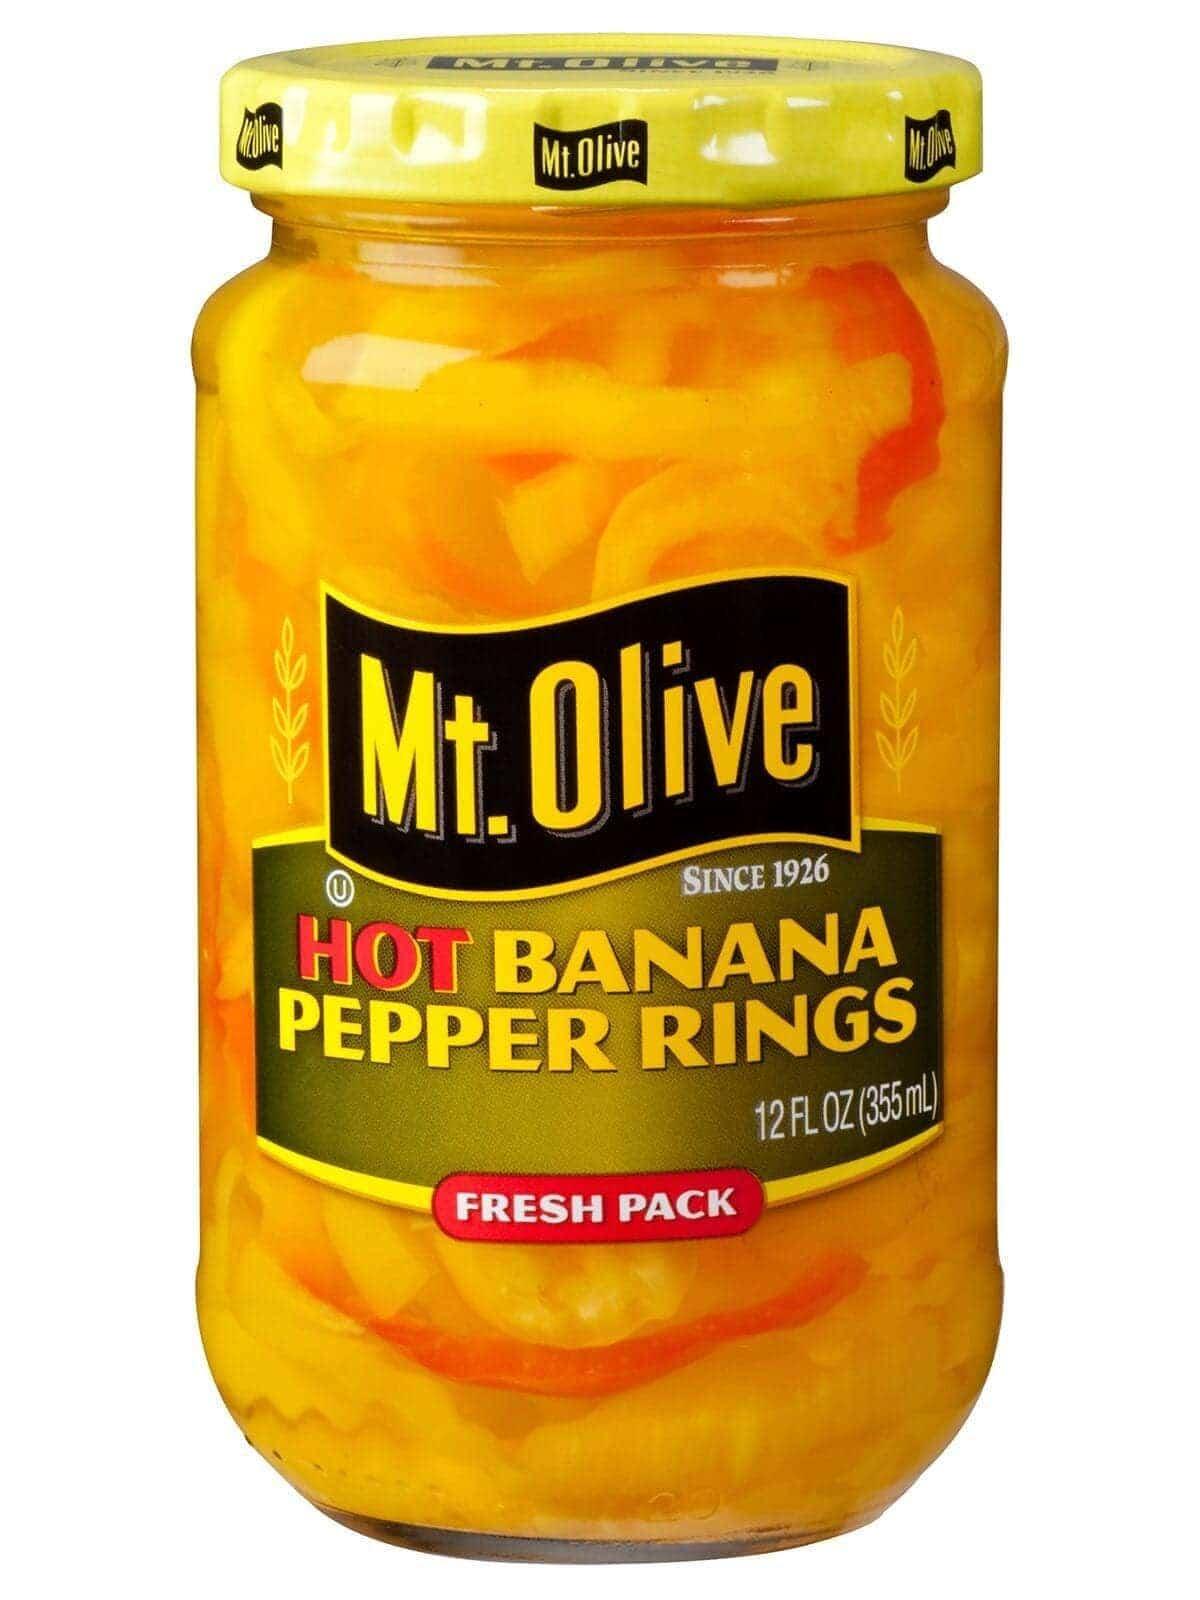 Hot Banana Pepper Rings - Mt Olive Pickles